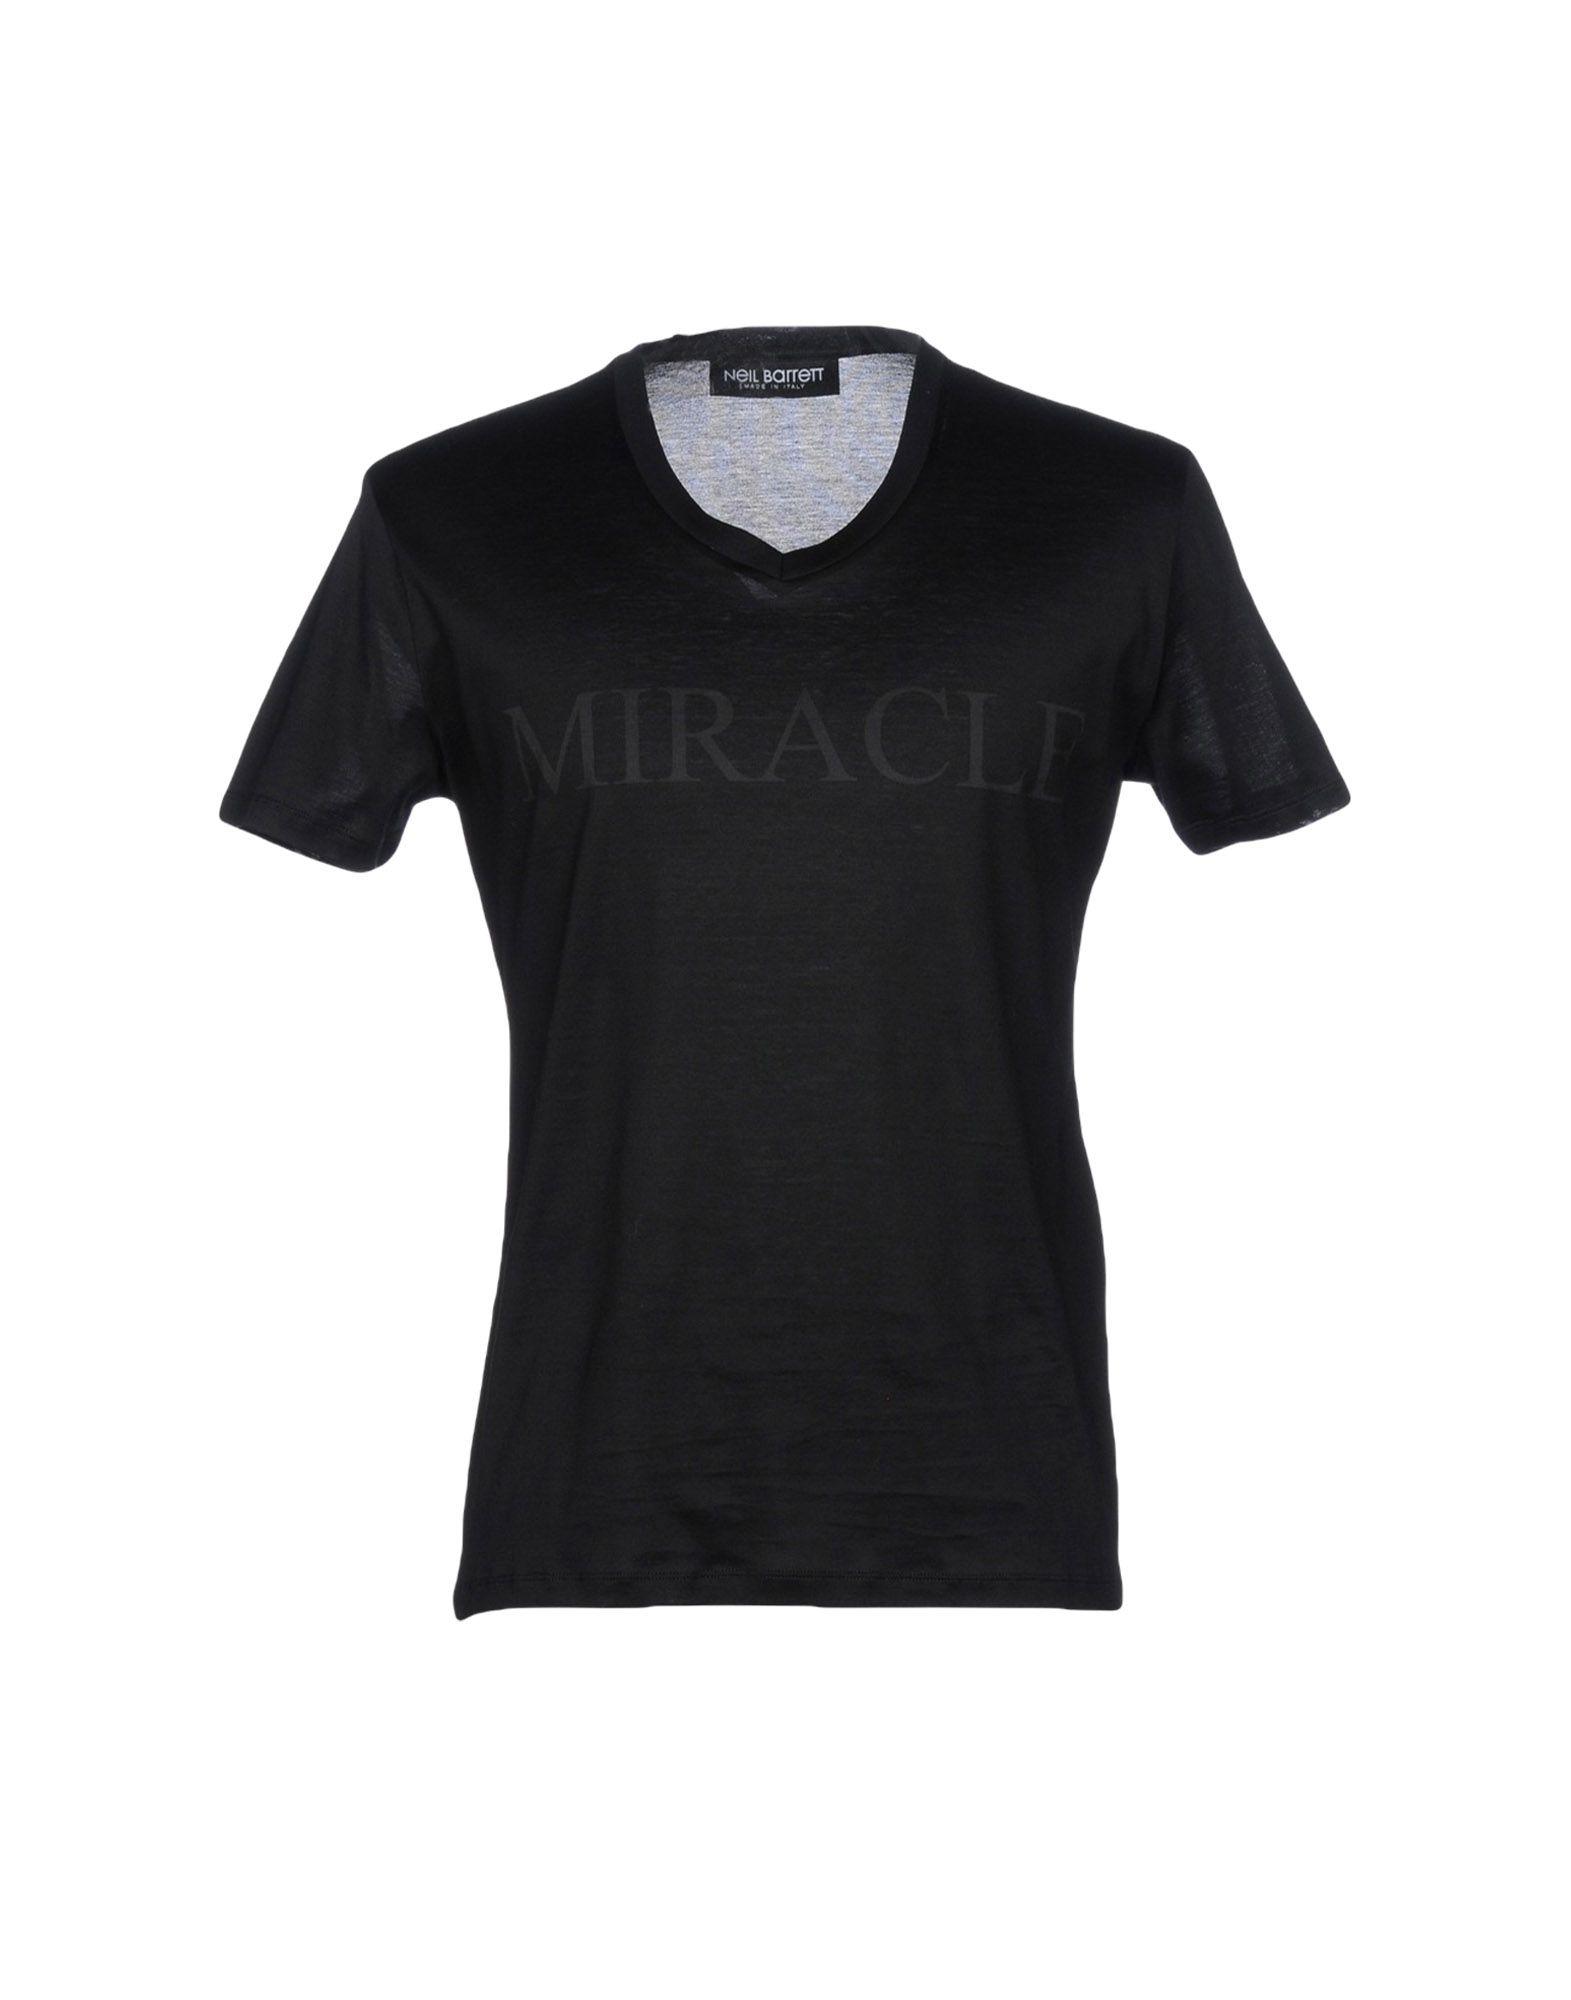 NEIL BARRETT Футболка футболка мужская neil barrett fa01 2015